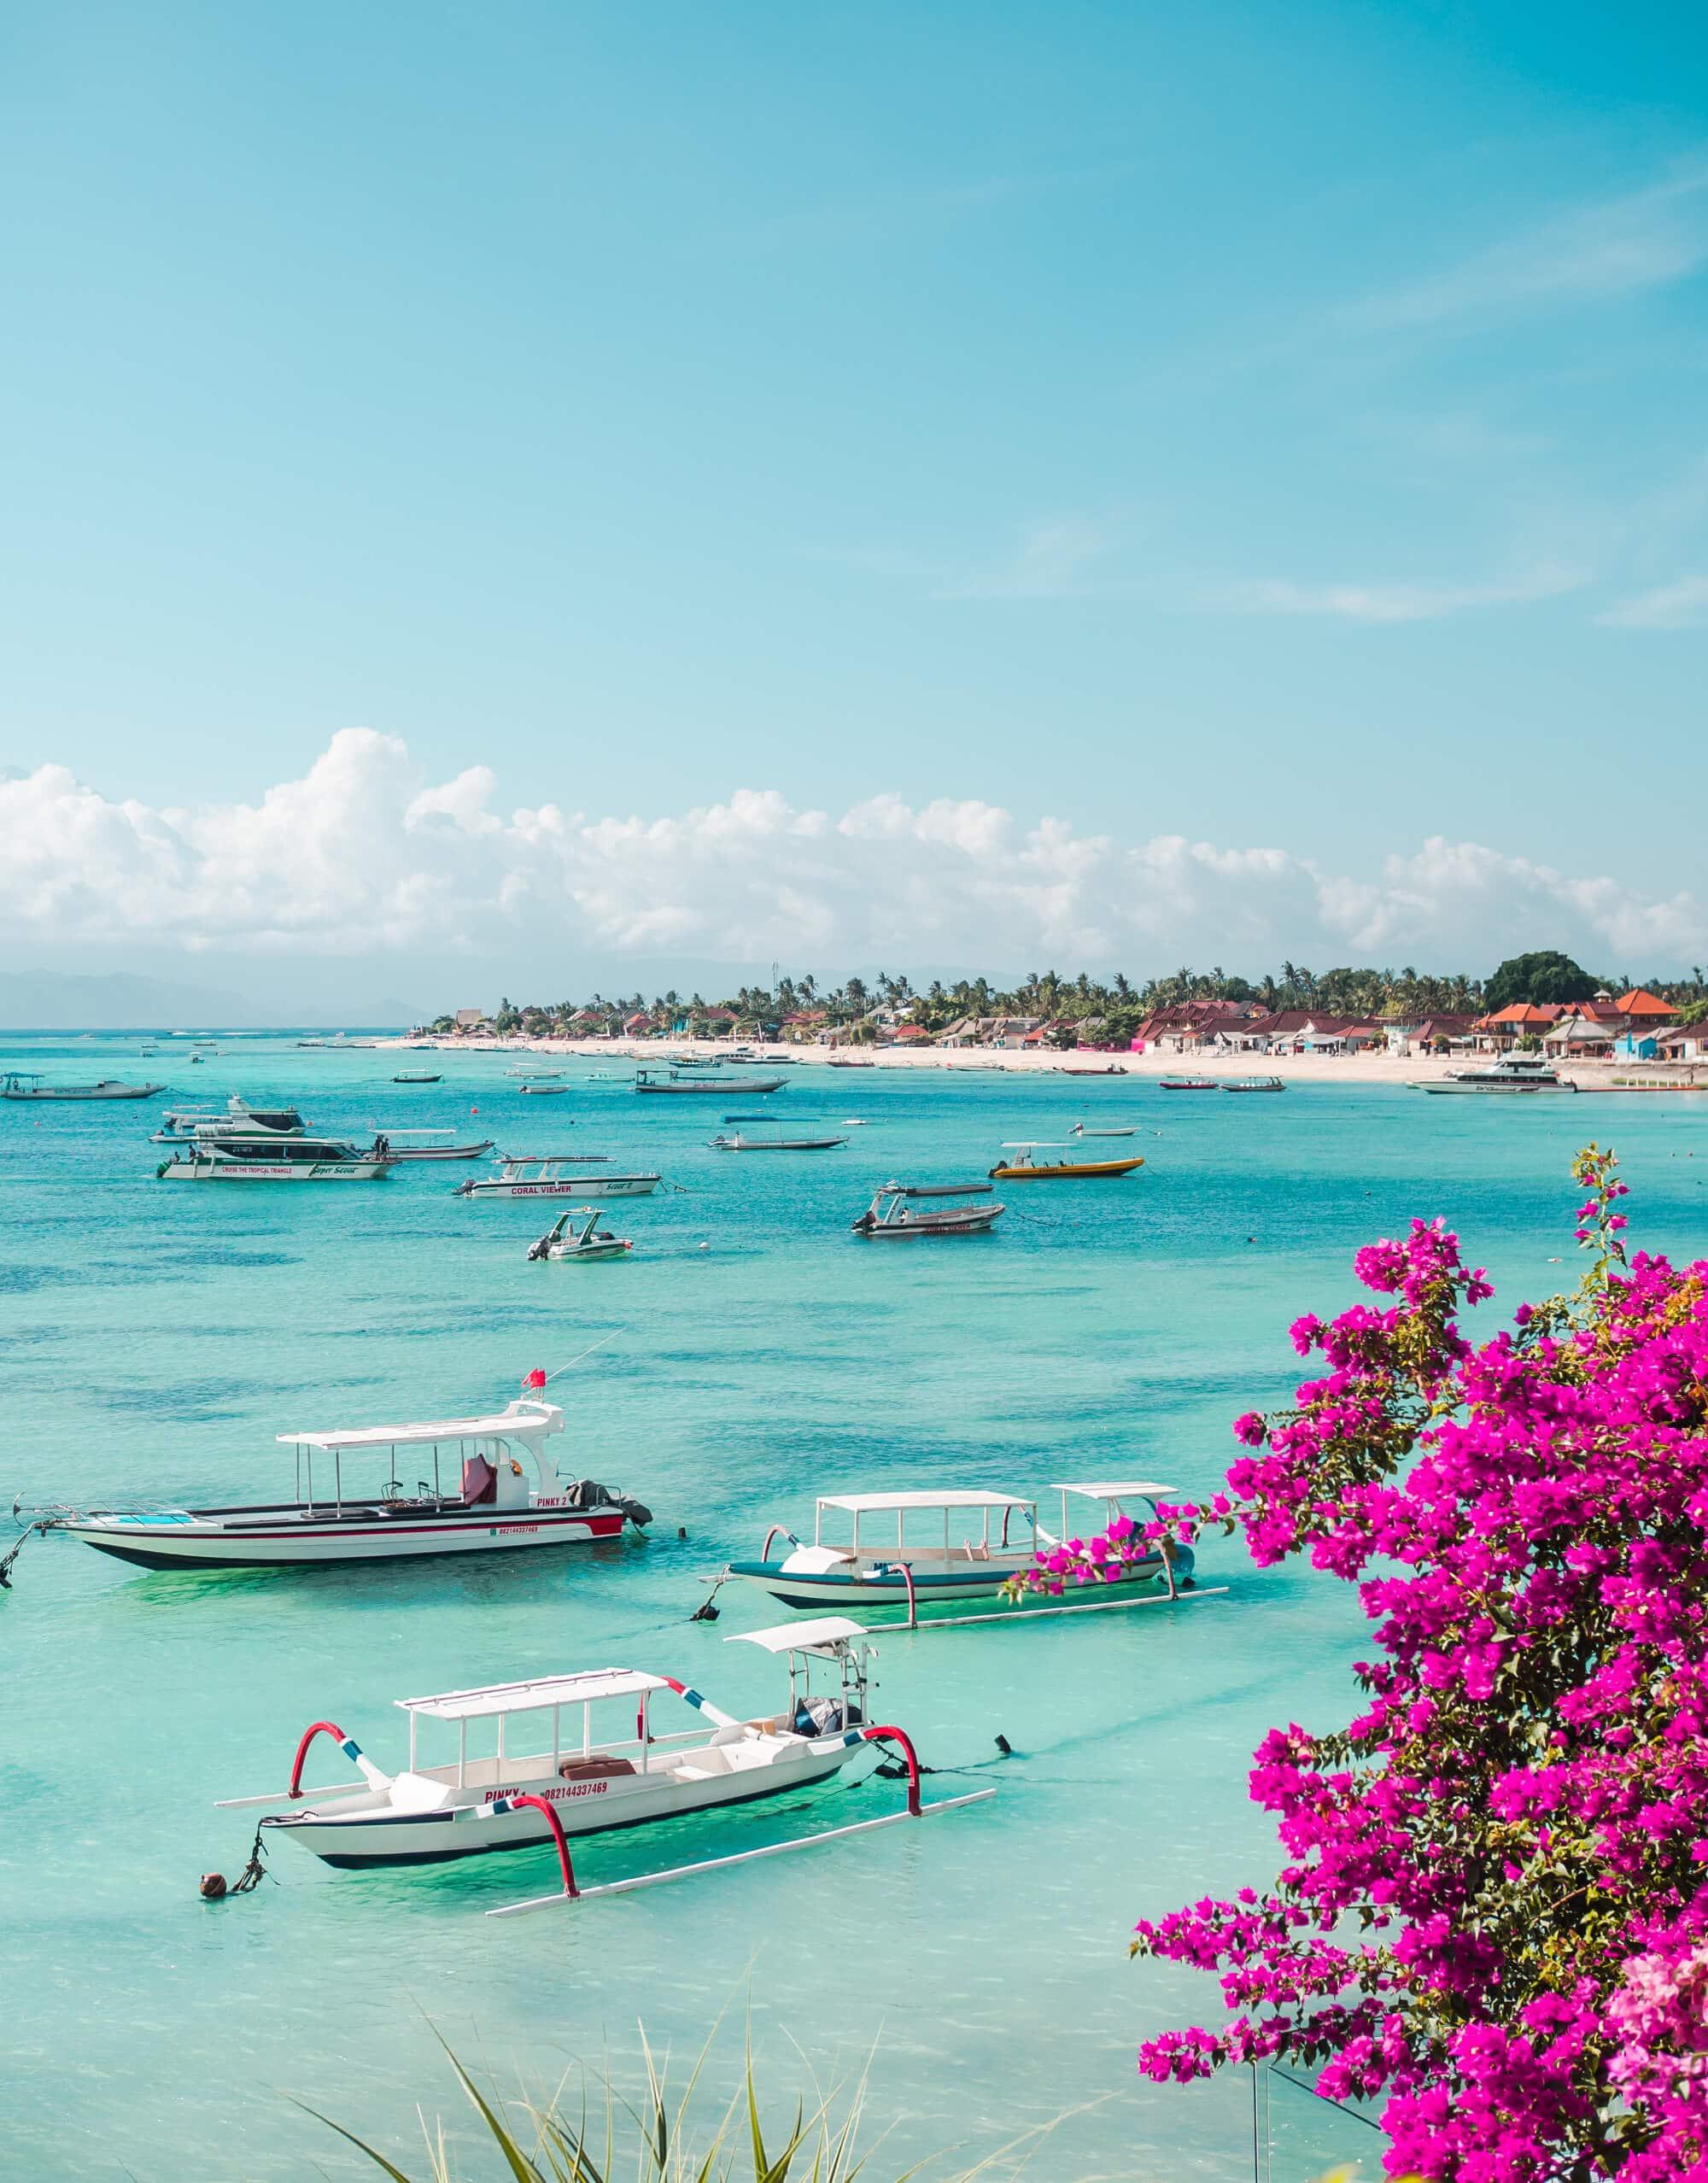 The ultimate 2 week Bali itinerary - Nusa Lembongan boardwalk view